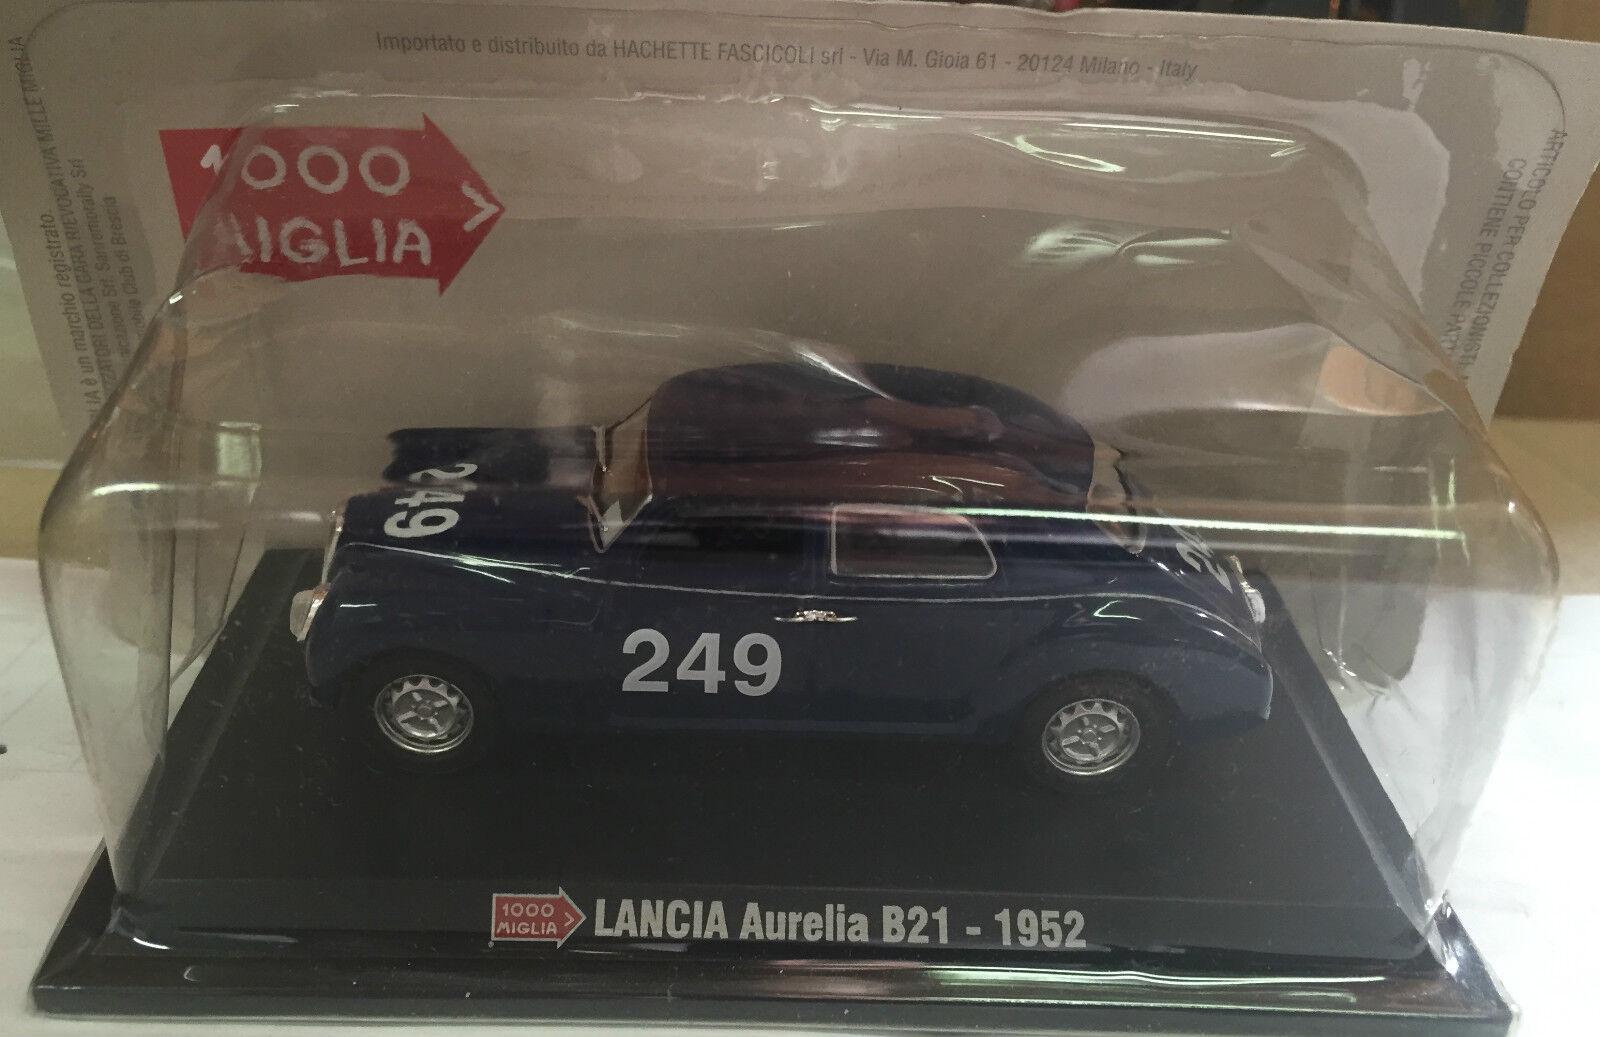 MUERE EL MOLDE 1000 1000 1000 MIGLIA   LANCIA AURELIA B21 - 1952   + CAJA 2 ESCALA 1 43 443305